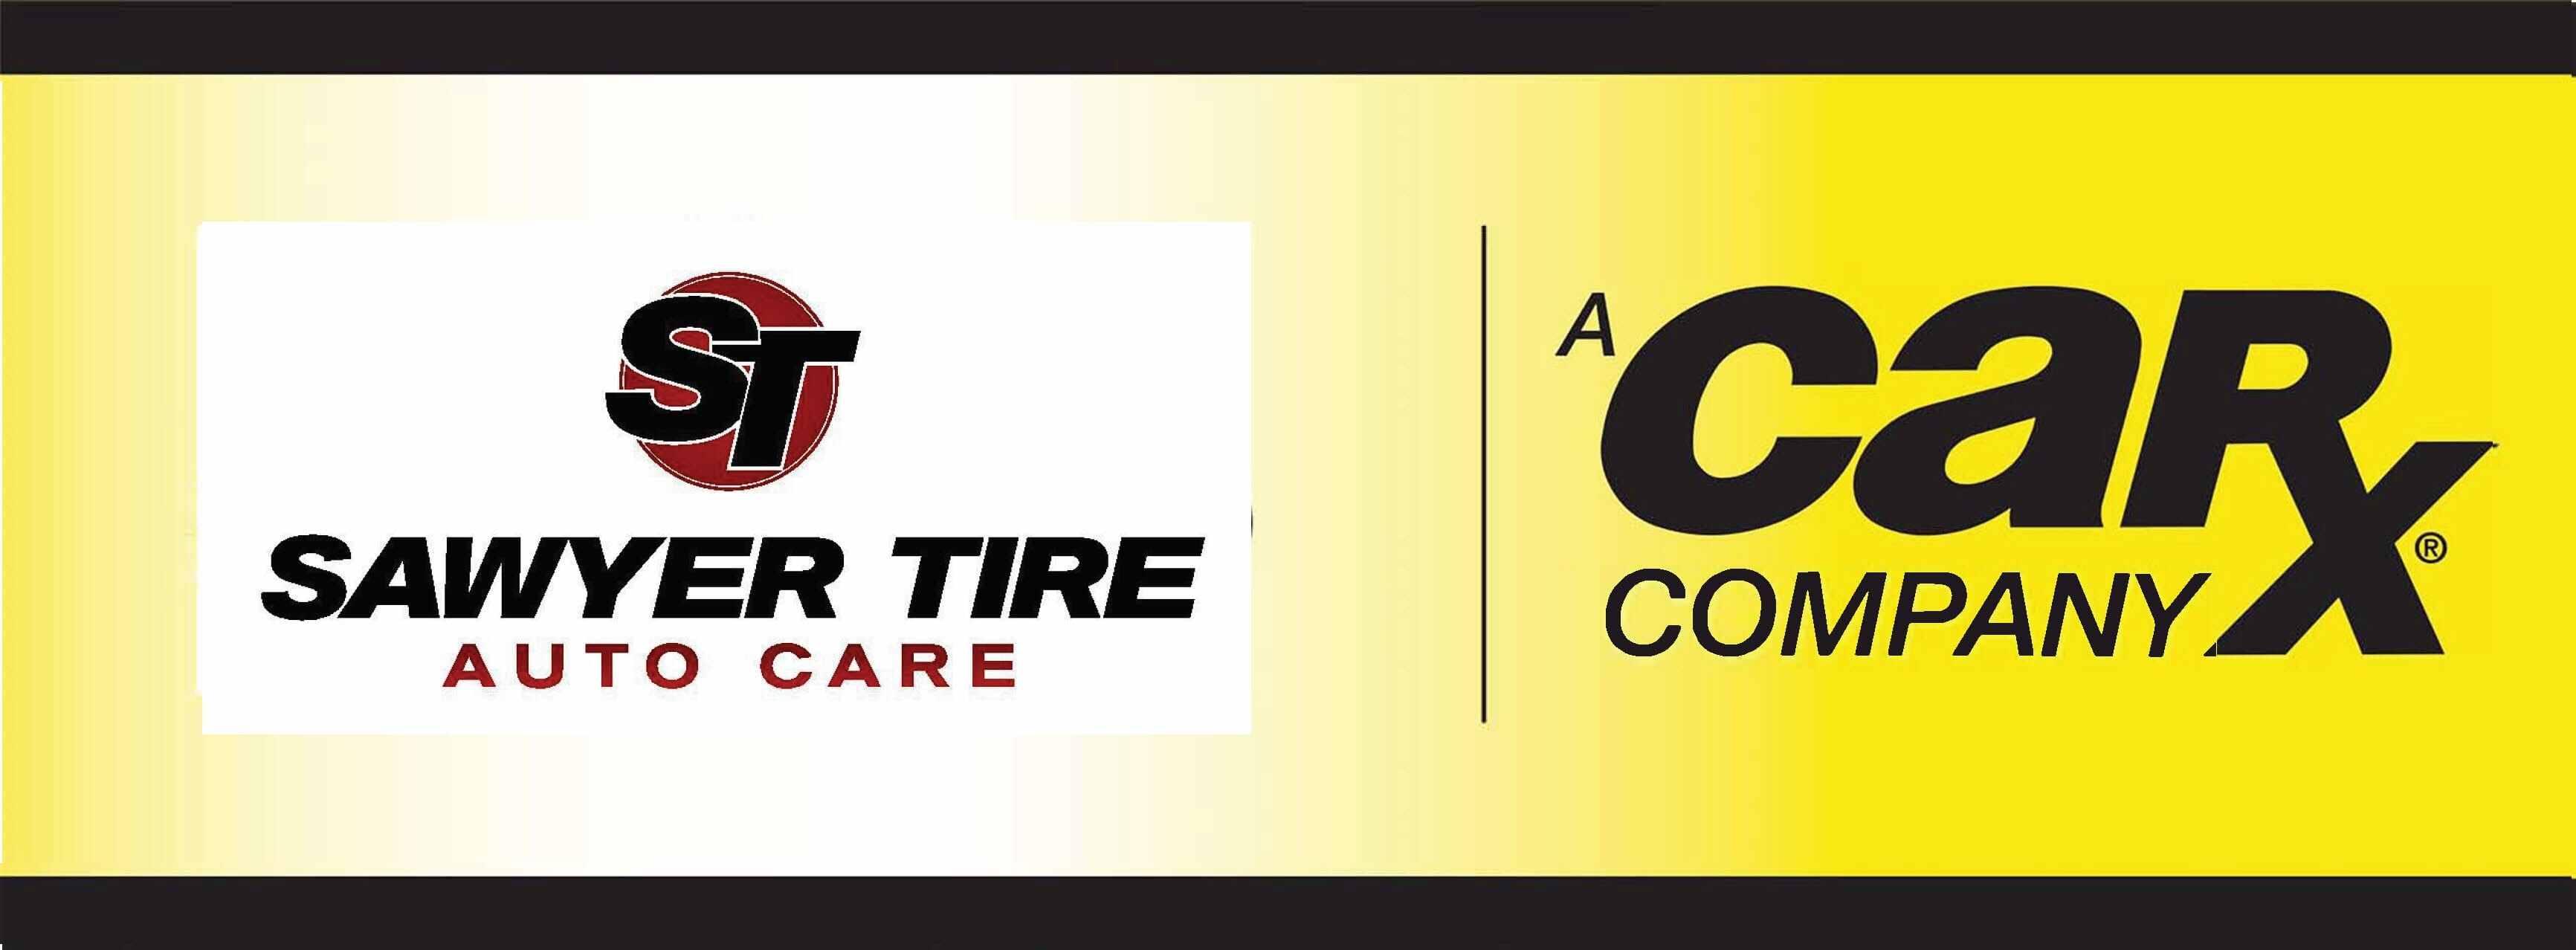 Auto Repair Lebanon MO, Tires Lebanon MO, Oil Change Lebanon MO, Brakes Lebanon MO